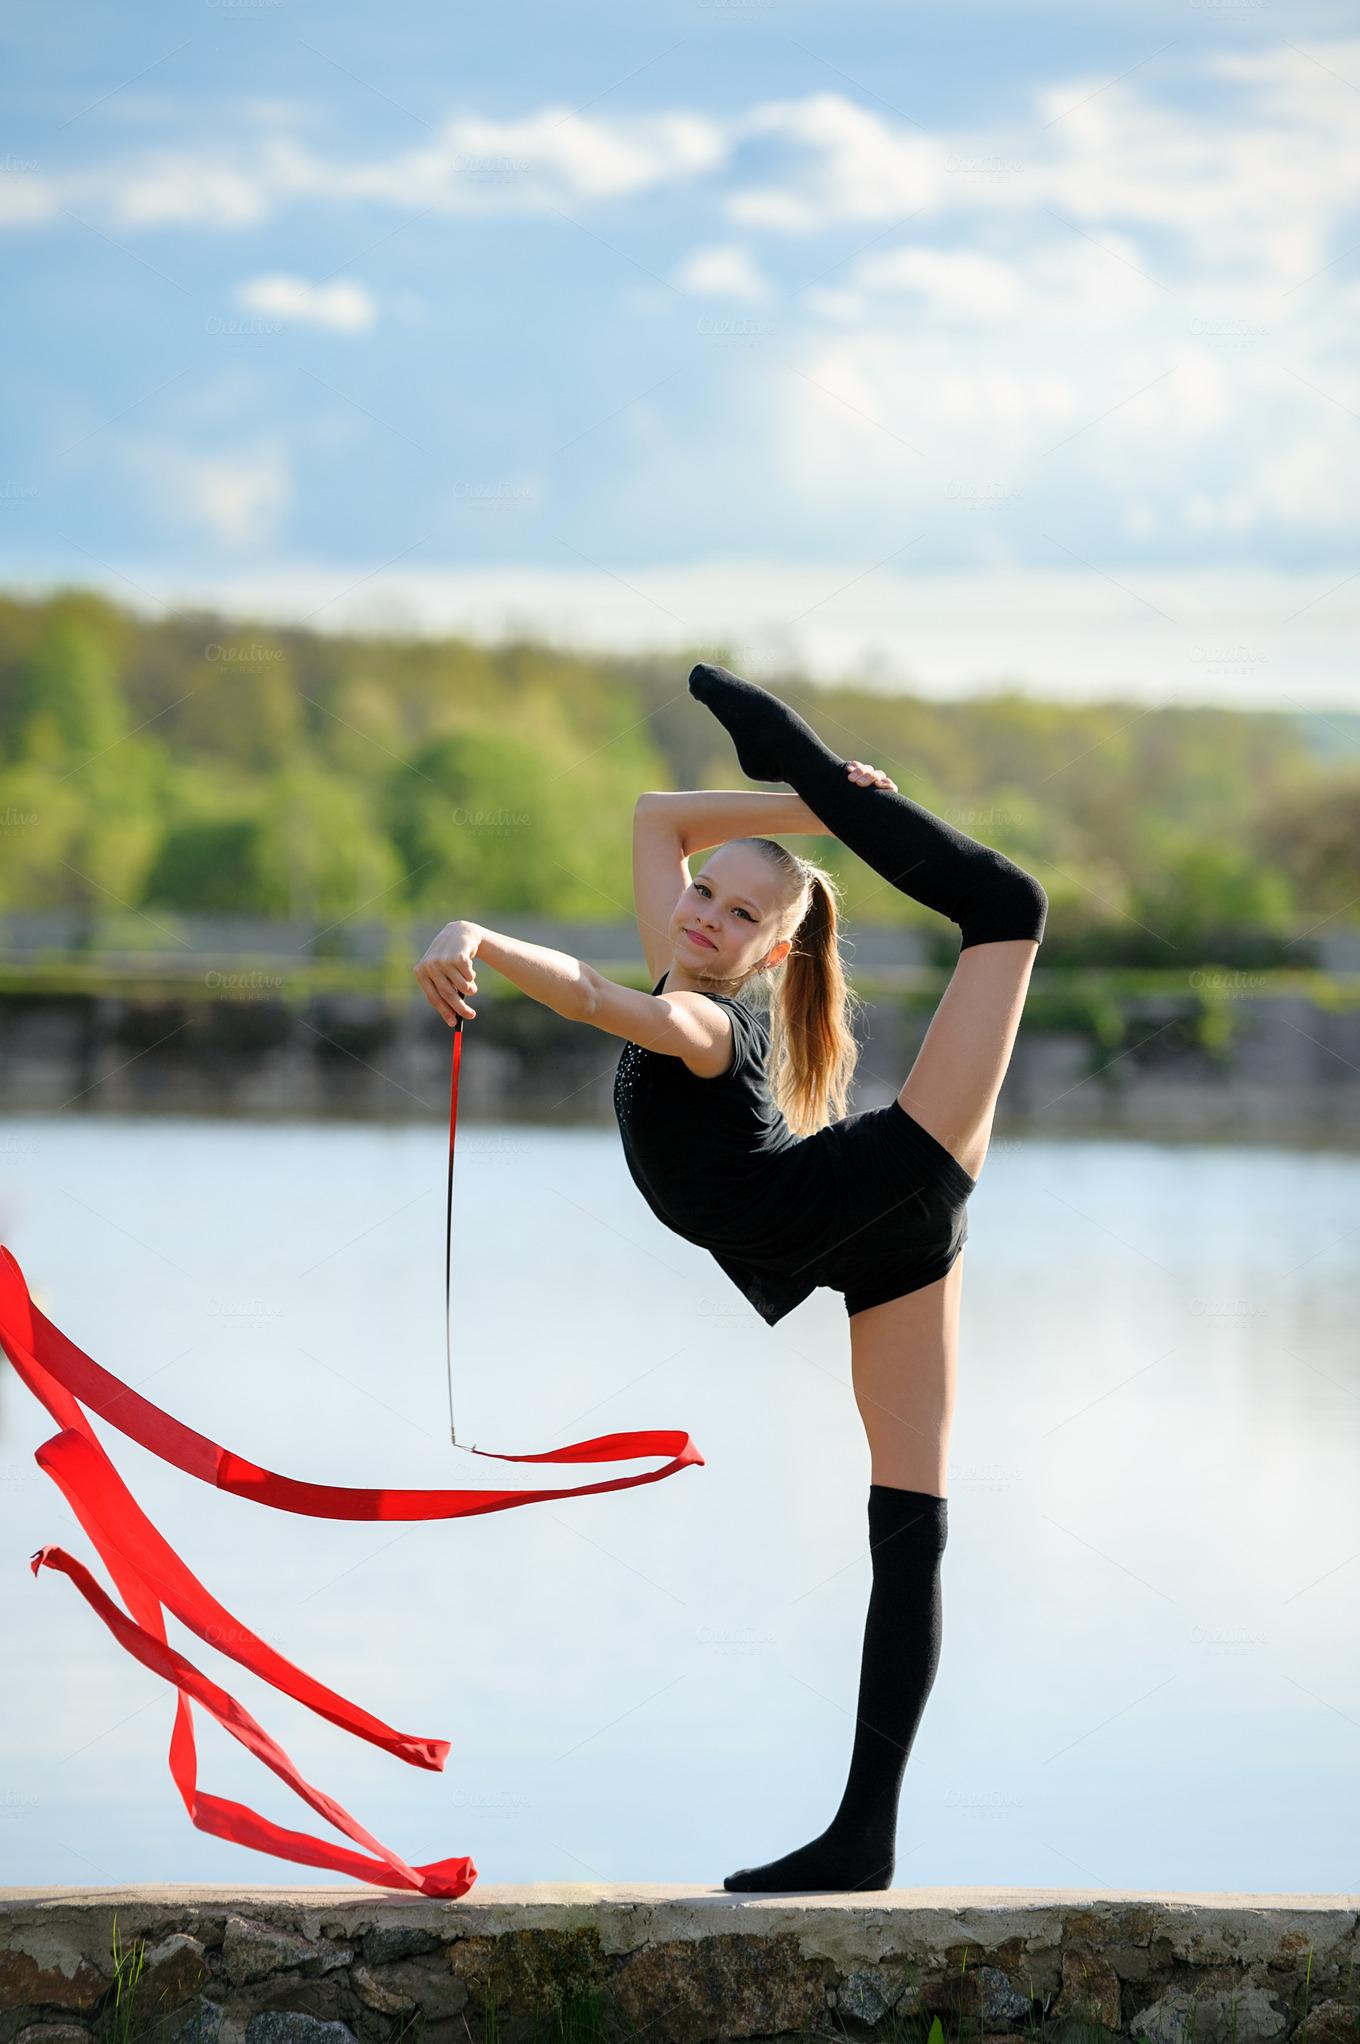 rhythmic gymnast in vertical split